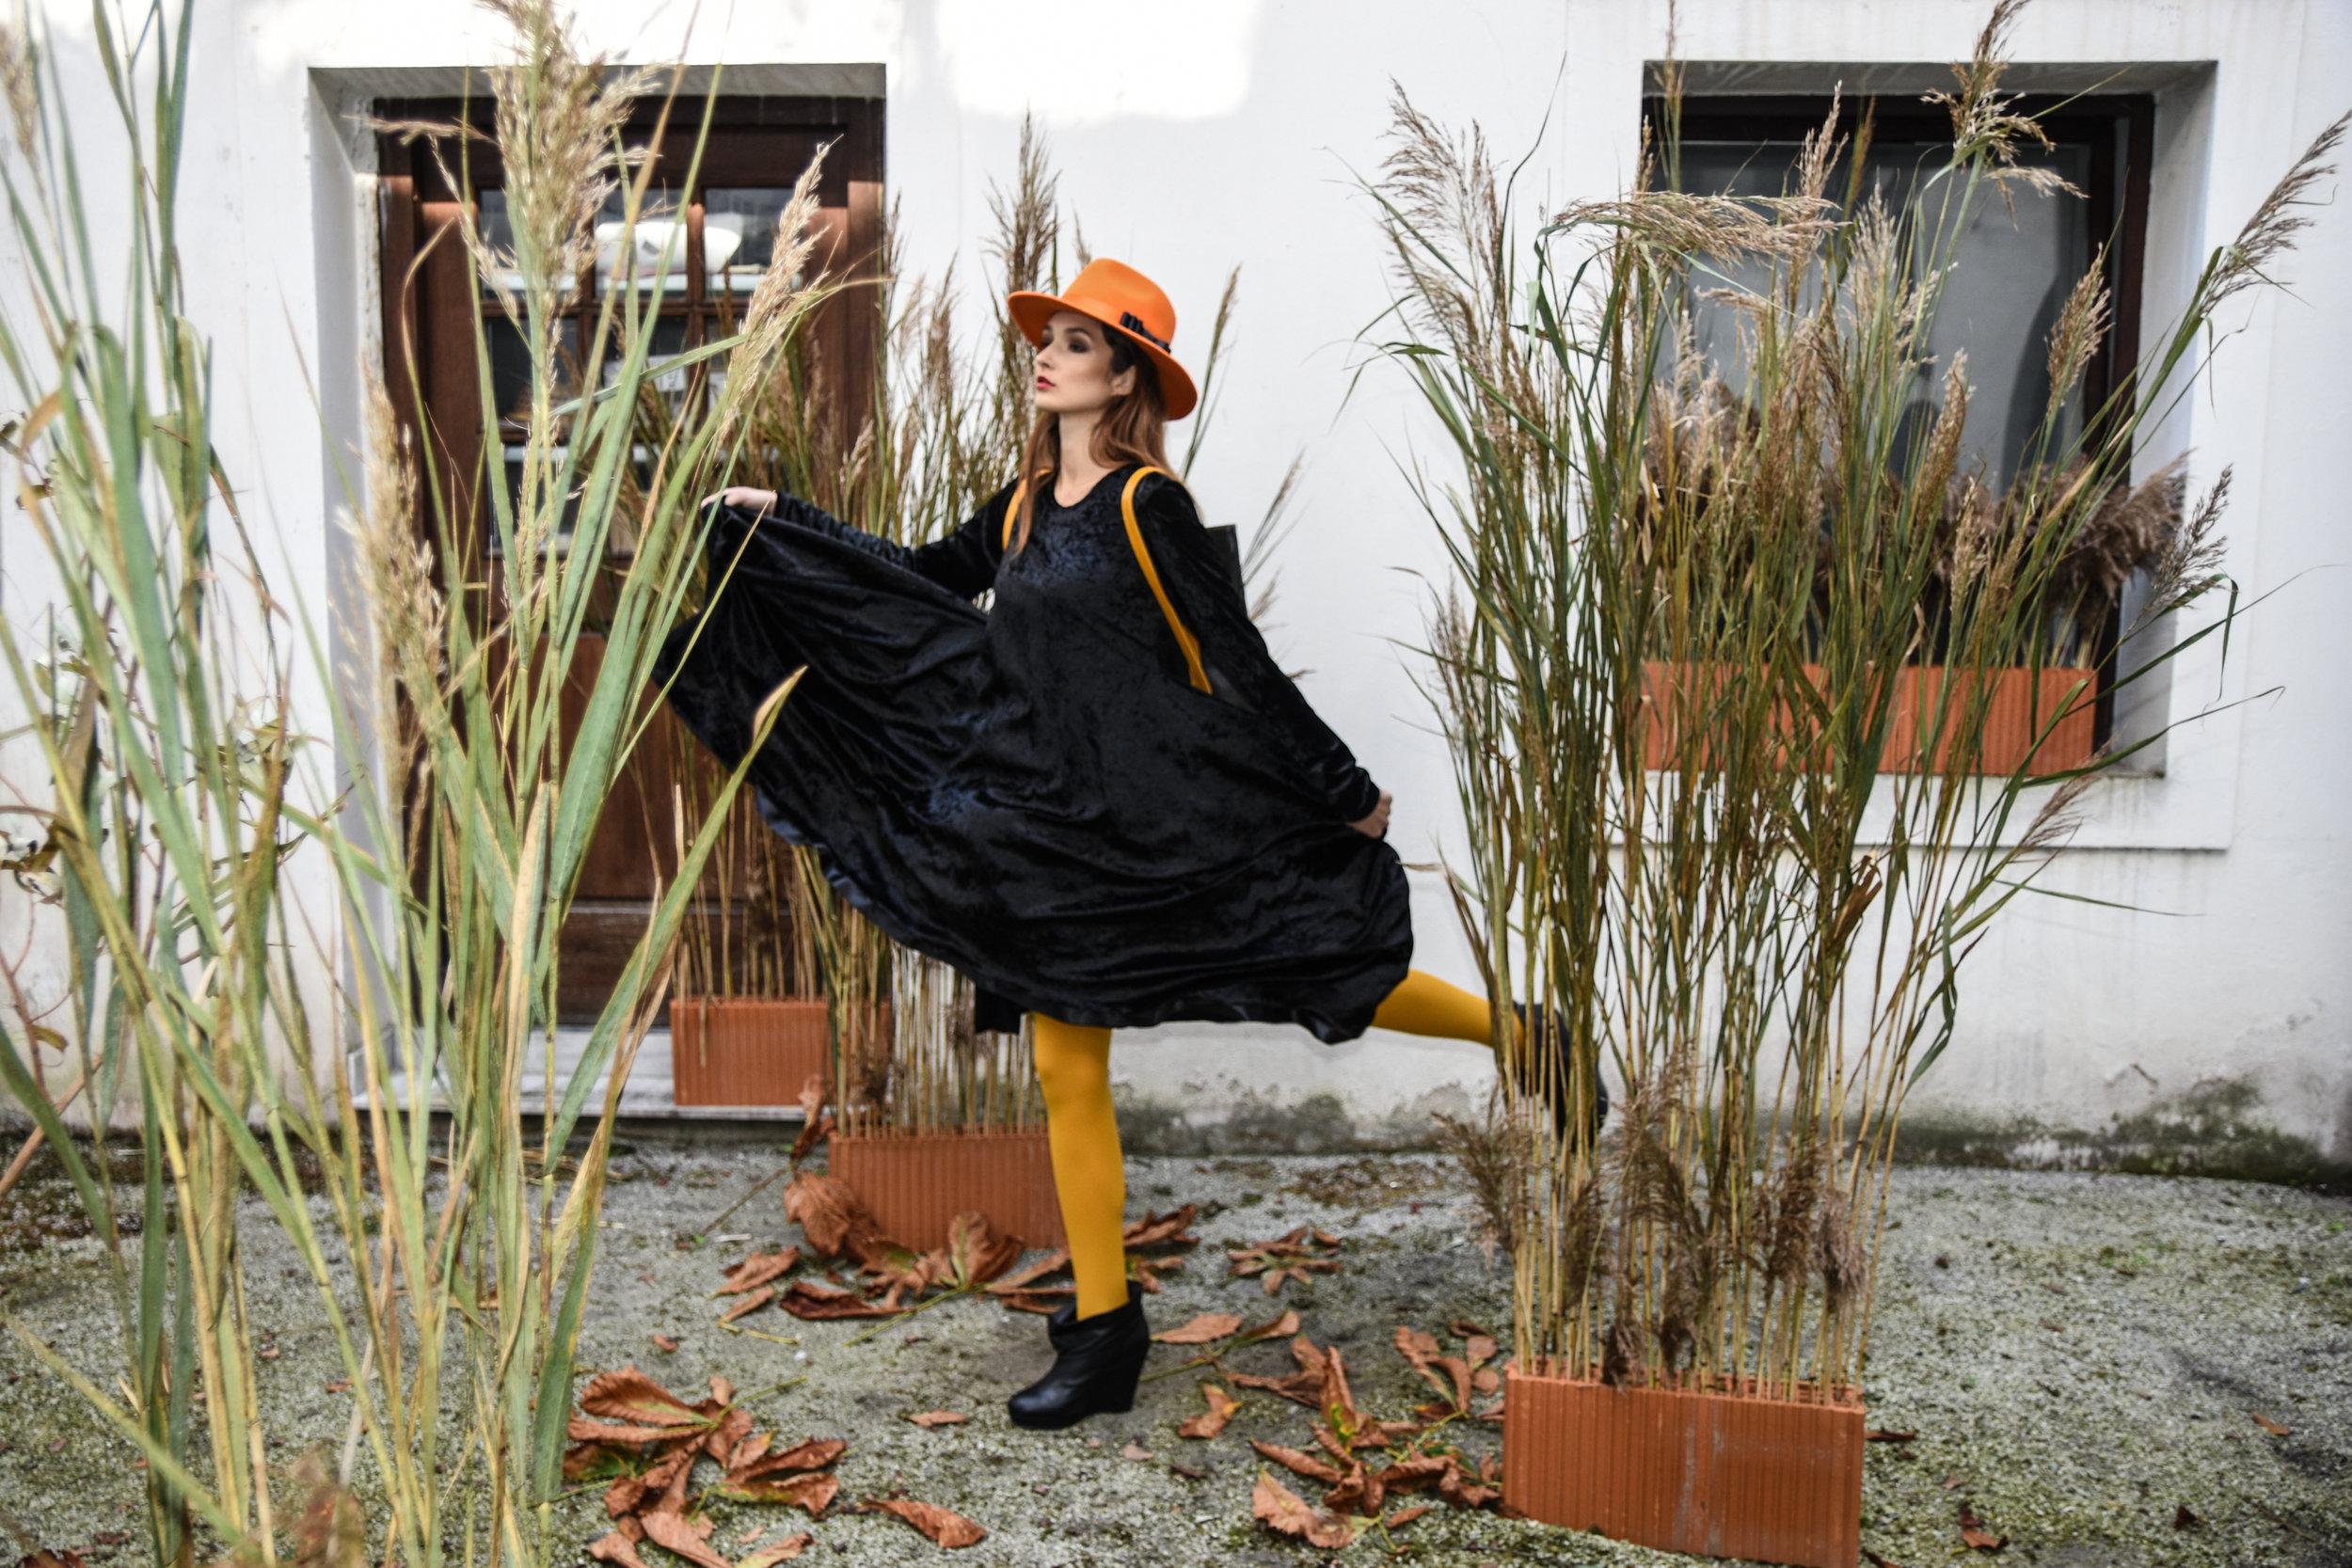 David obleka 140 eur  Zelolepo torba 315 eur  klobuk Blond Bliss 260 eur